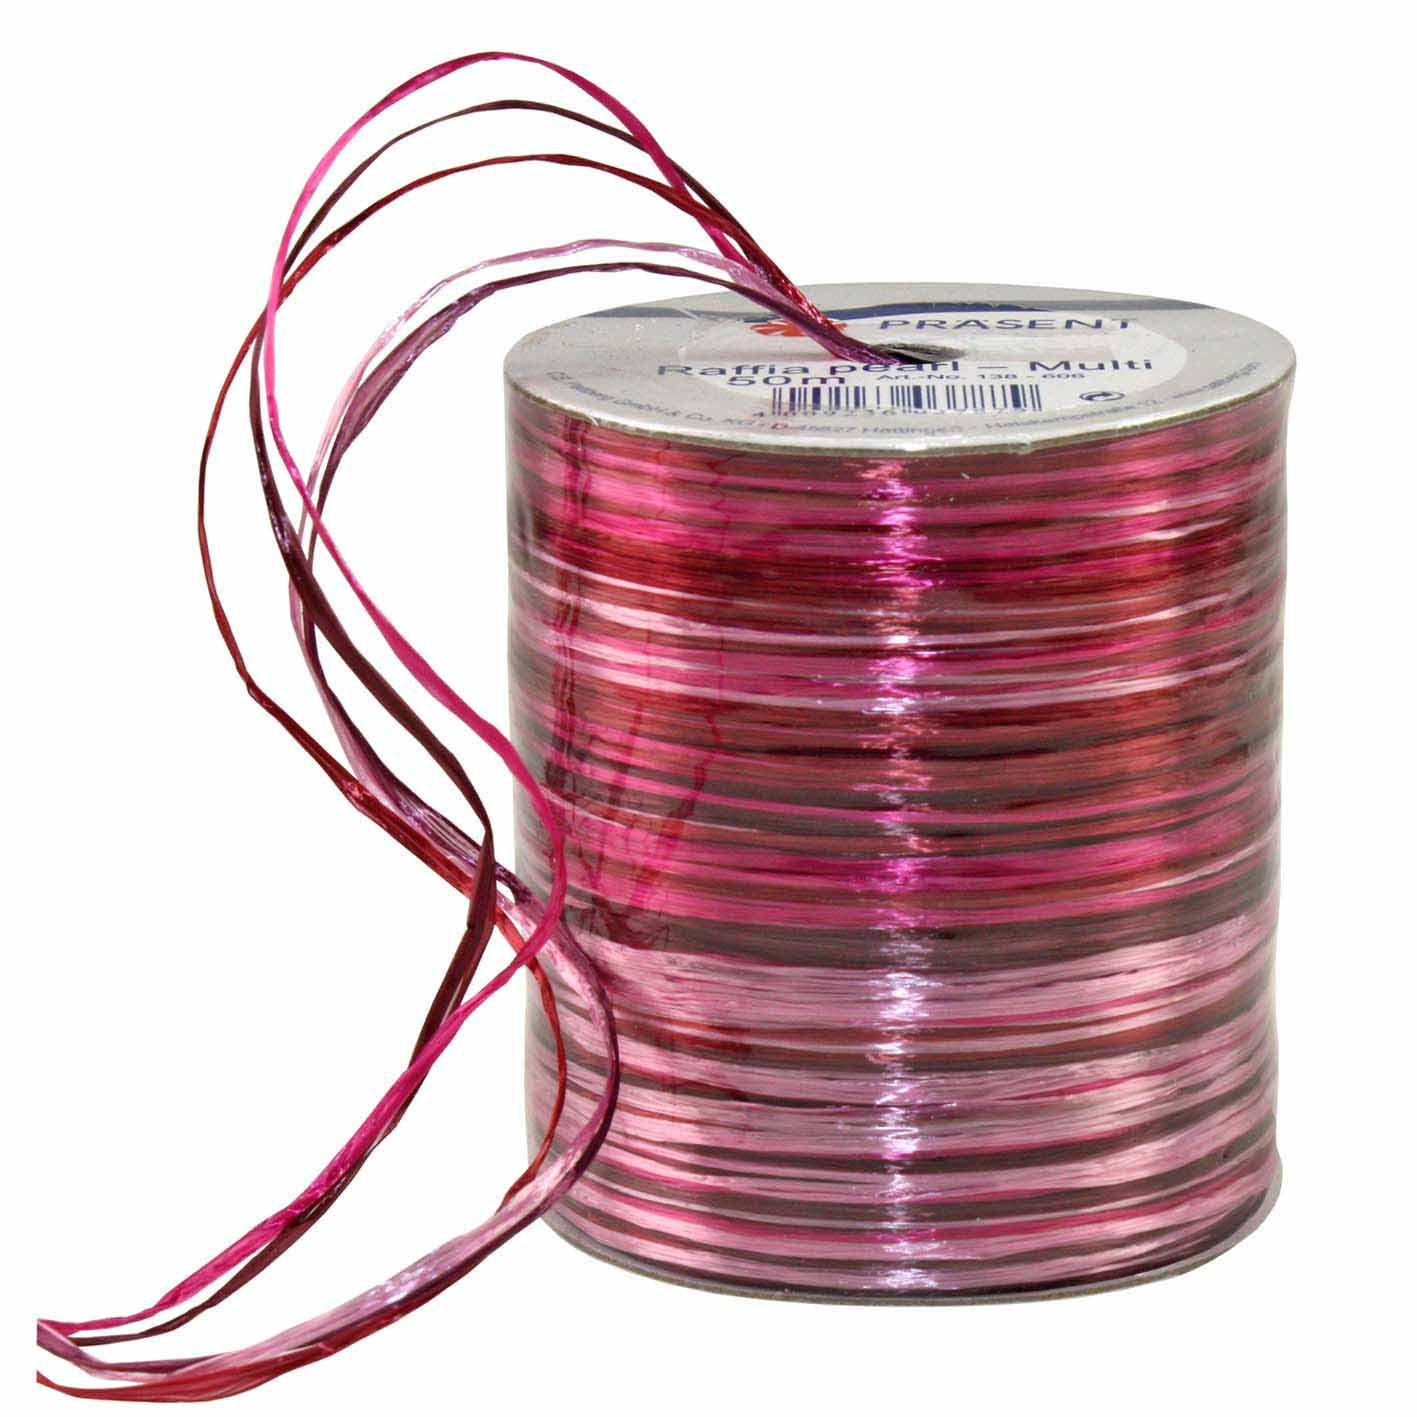 Bolduc raphia multicolore 5 couleurs - 50 m - bobine n°32 (photo)